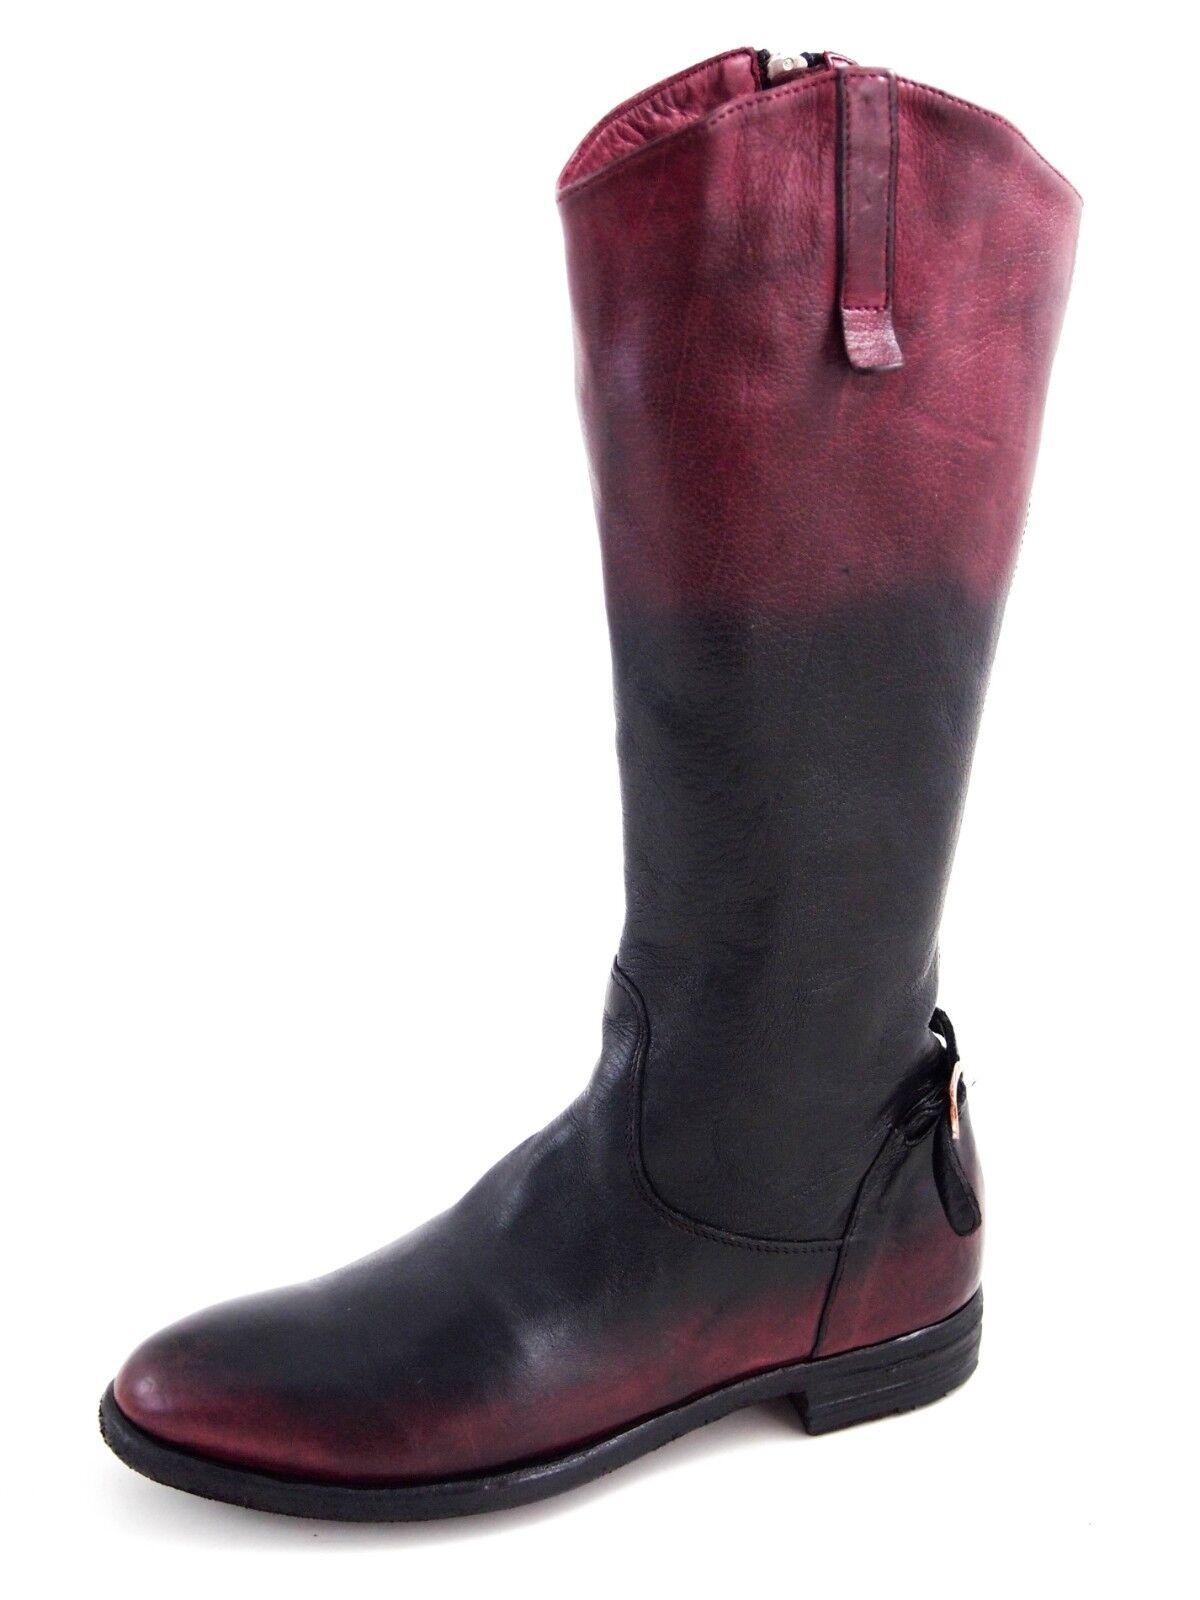 Officine Creative Kniehohe Stiefel,rotes schwarzes Leder Damengröße  EU  880